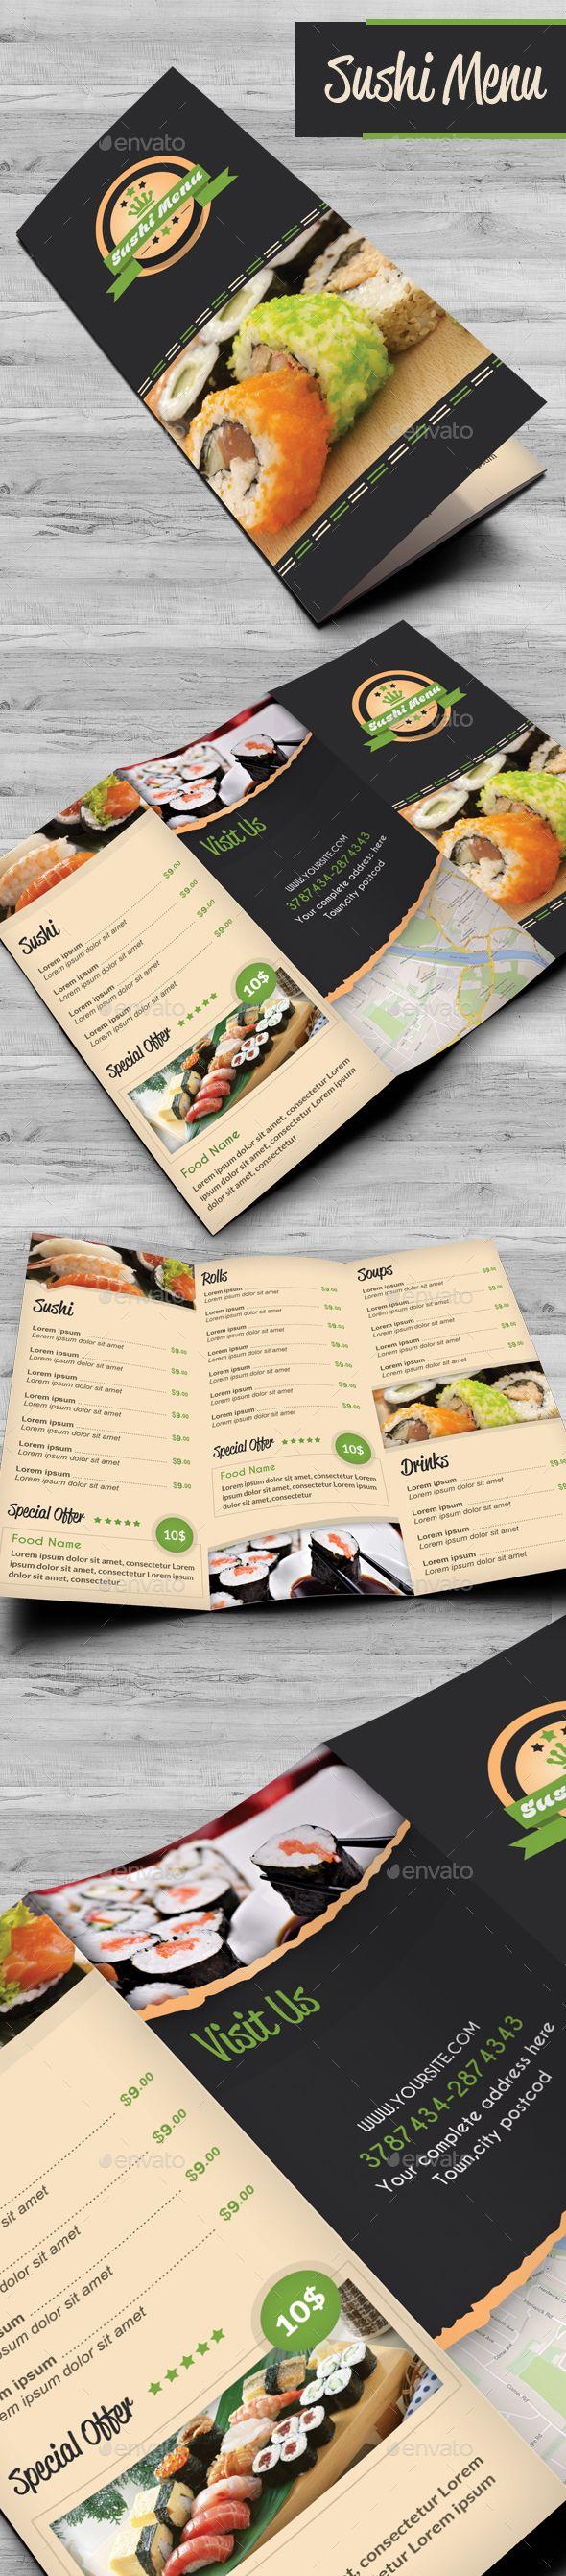 Sushi Food Menu Template PSD #design Download: http://graphicriver.net/item/sushi-food-menu/14168015?ref=ksioks